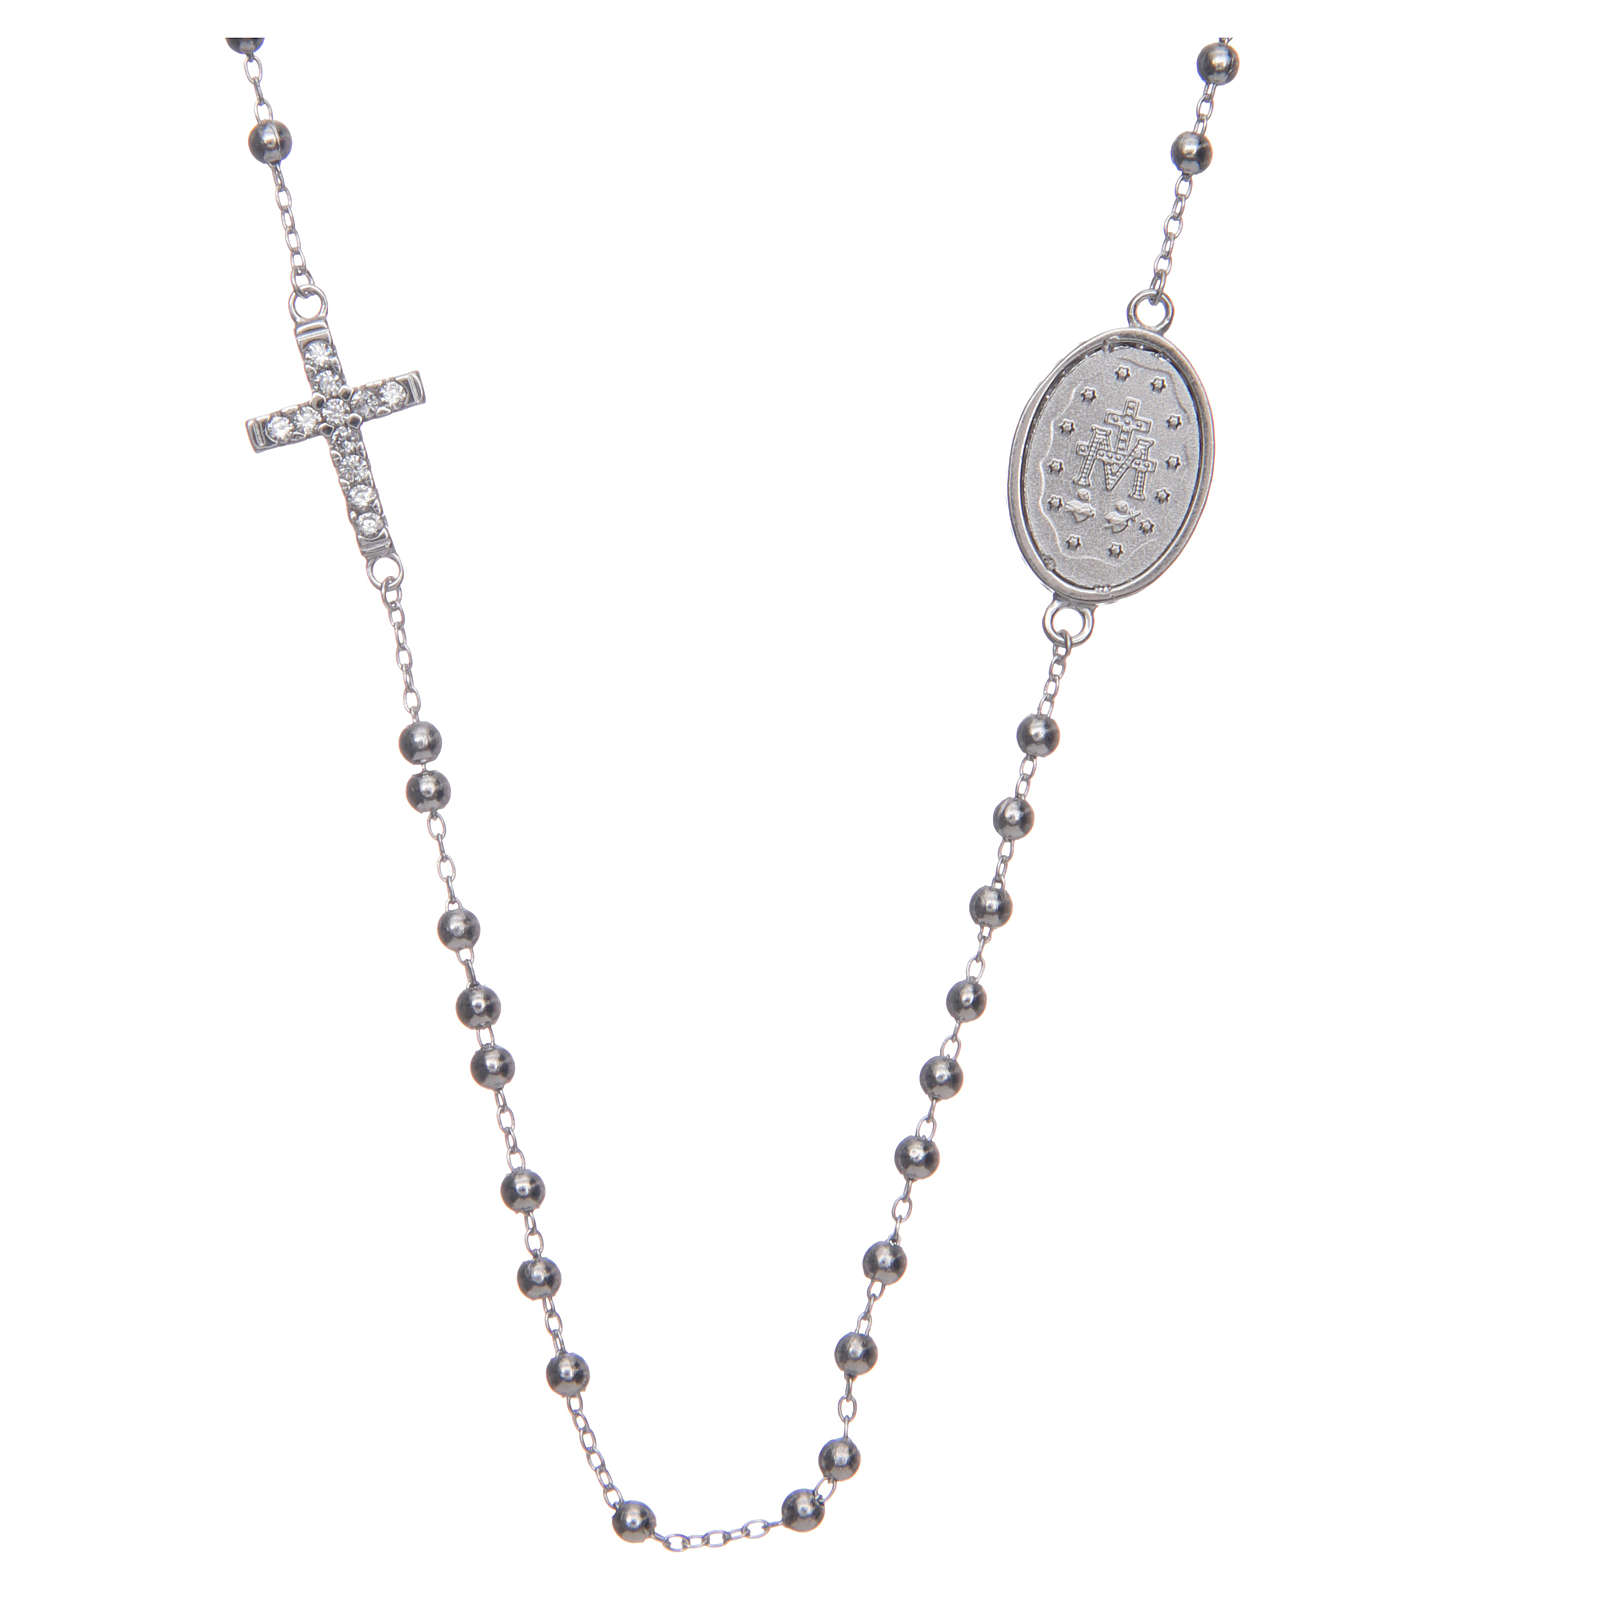 Rosario girocollo silver zirconi bianchi argento 925 4